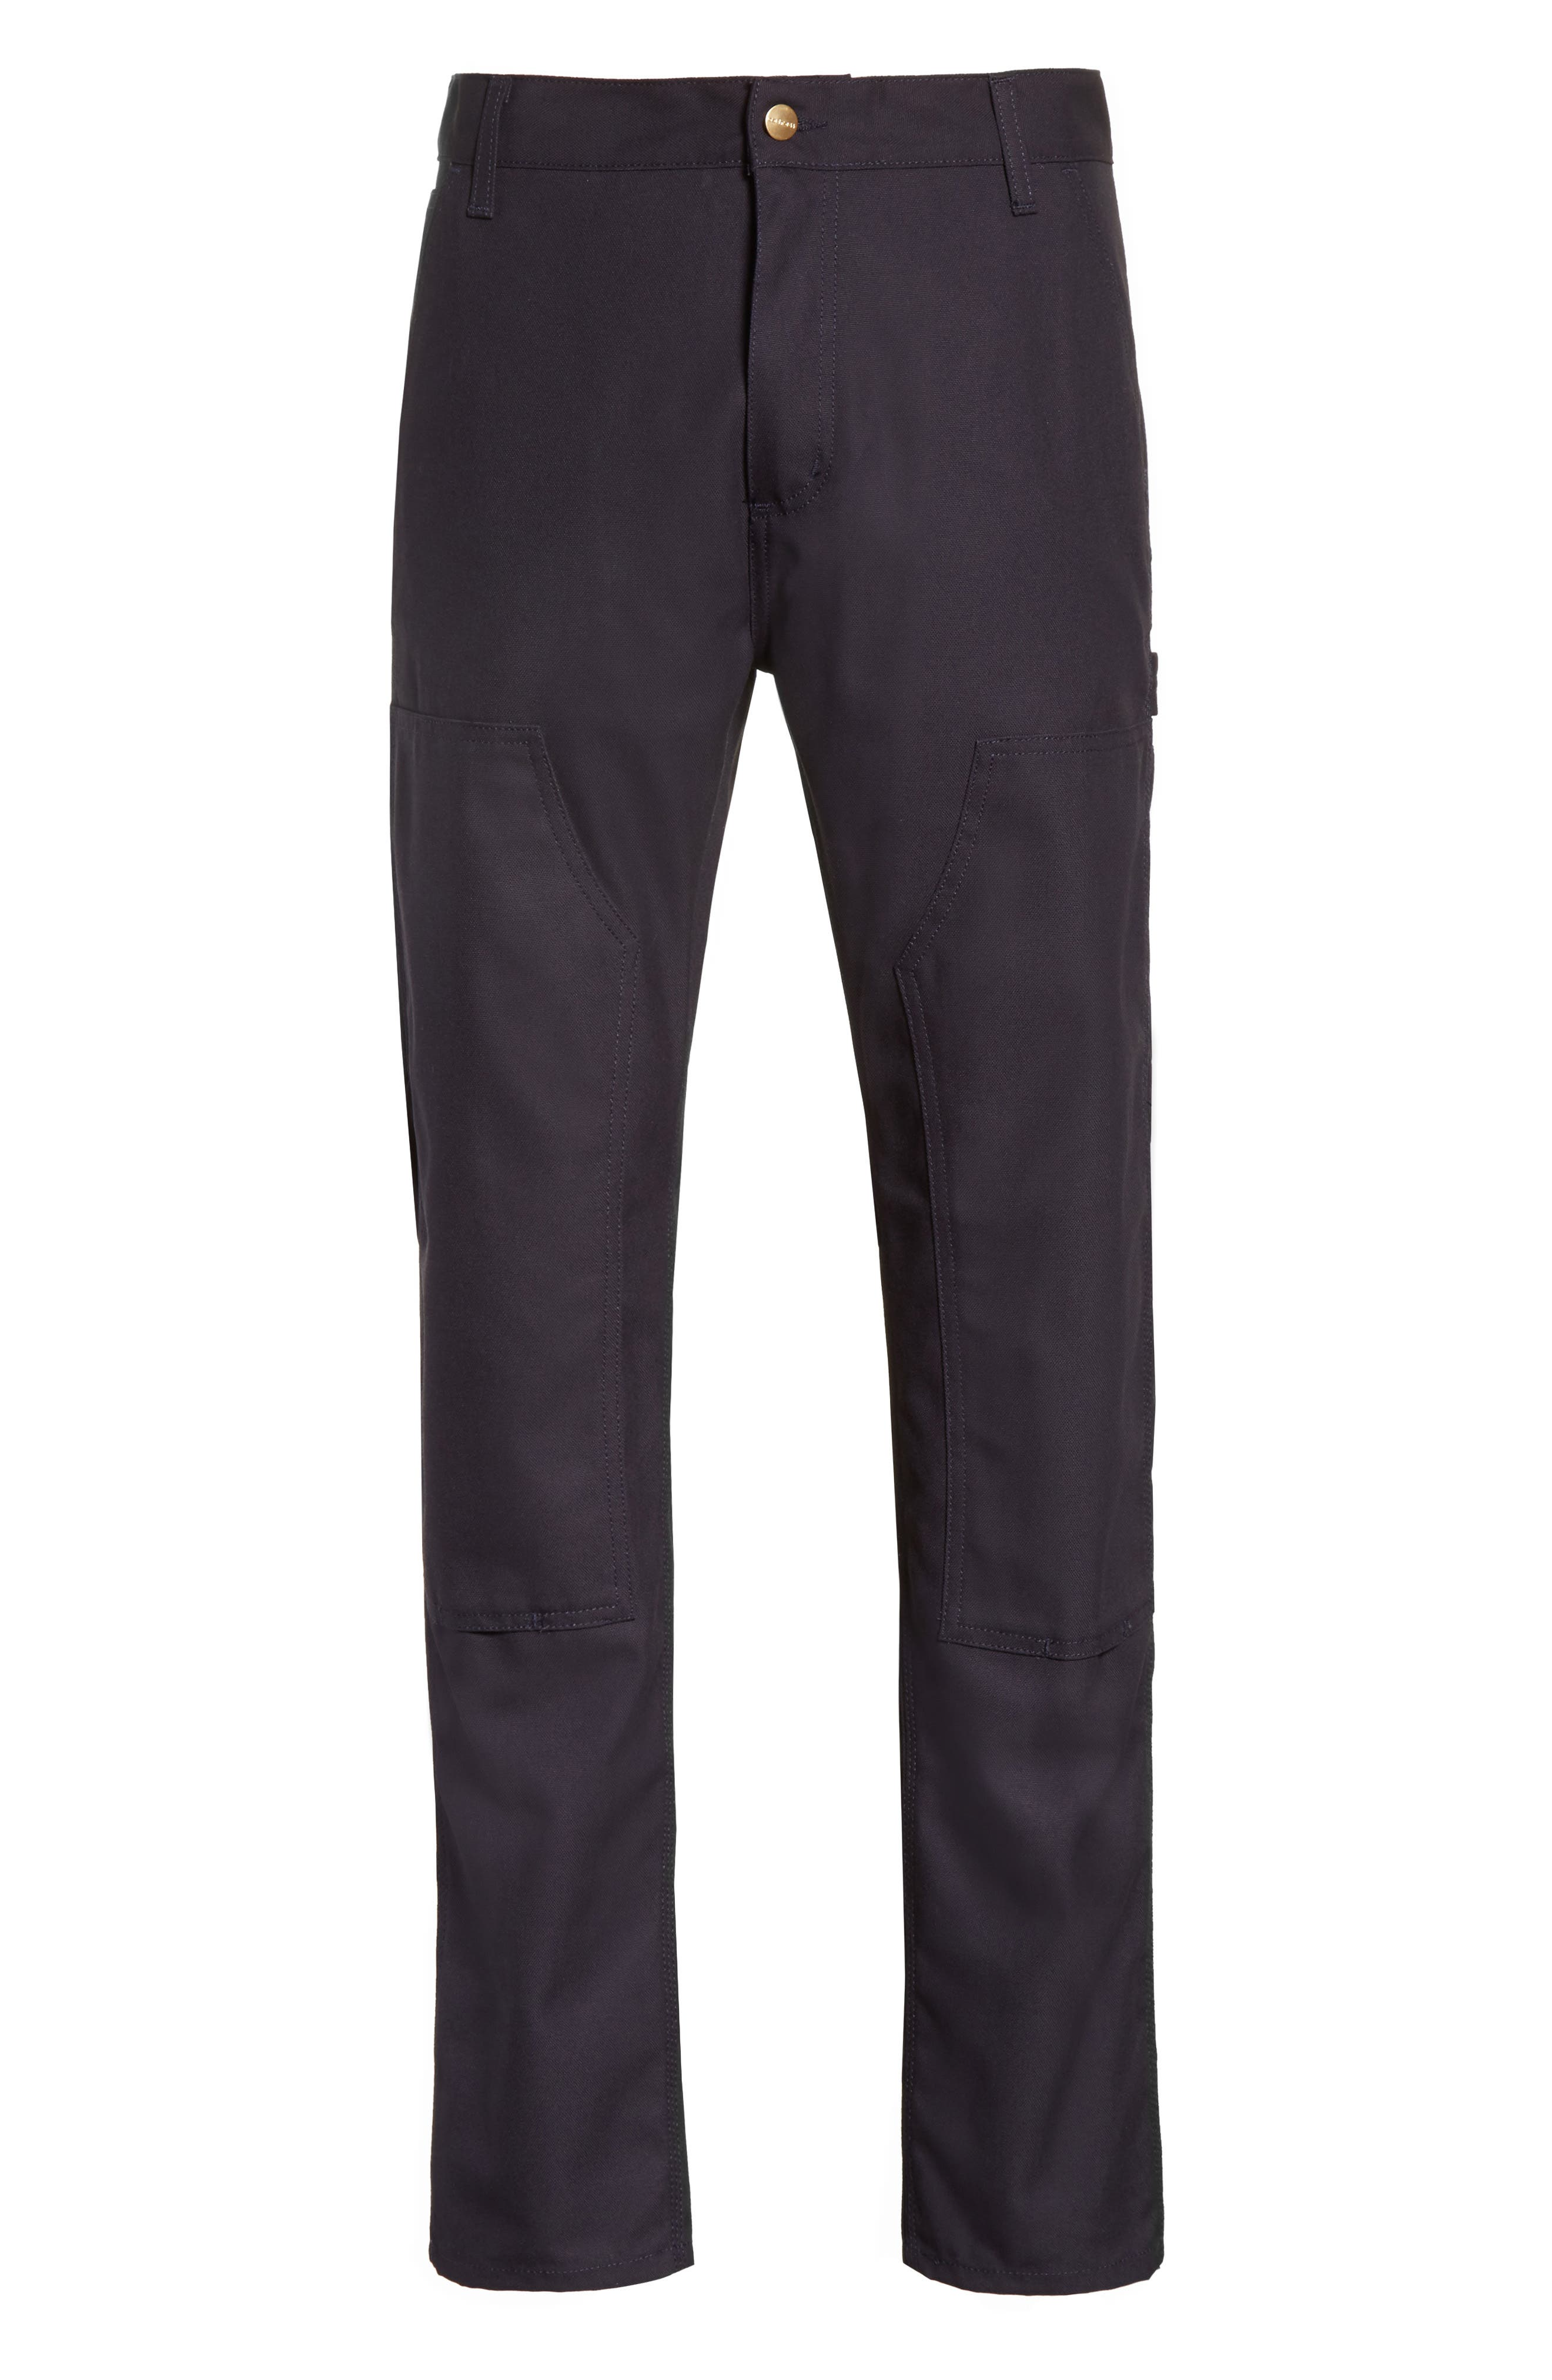 Ruck Double Knee Canvas Pants,                             Alternate thumbnail 6, color,                             Dark Navy